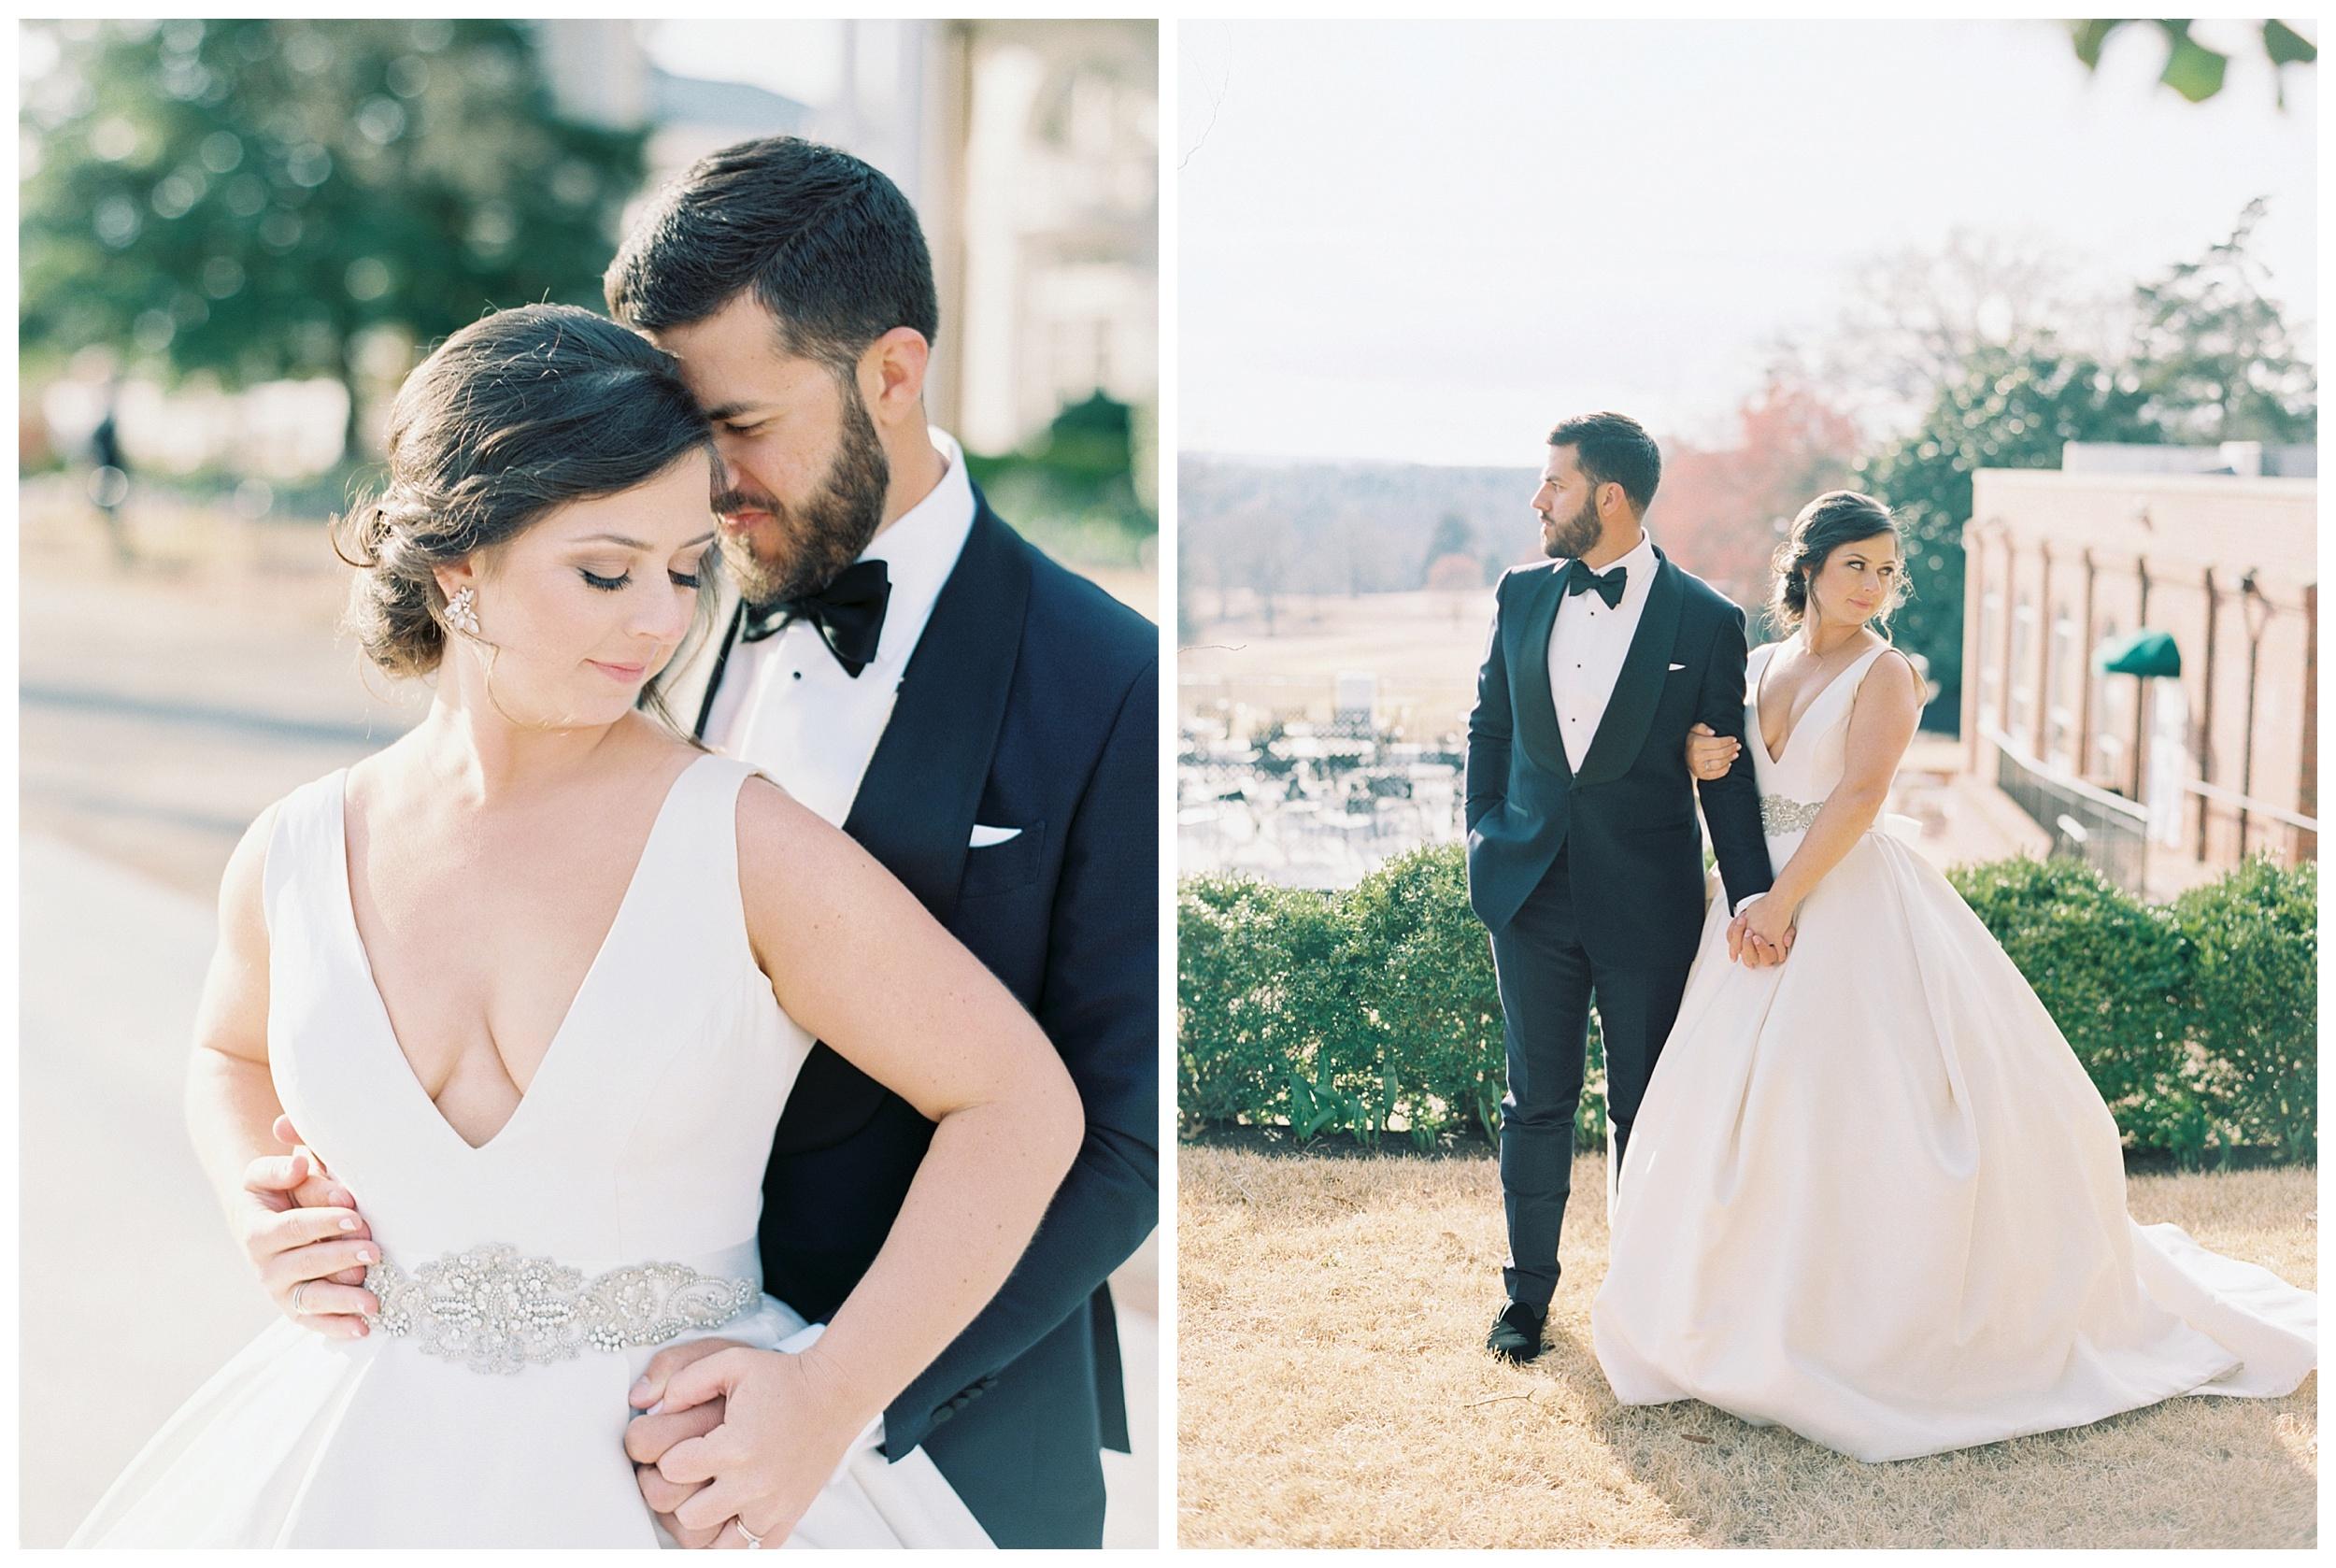 Country Club of Virginia Wedding | Richmond Wedding Photographer_0100.jpg